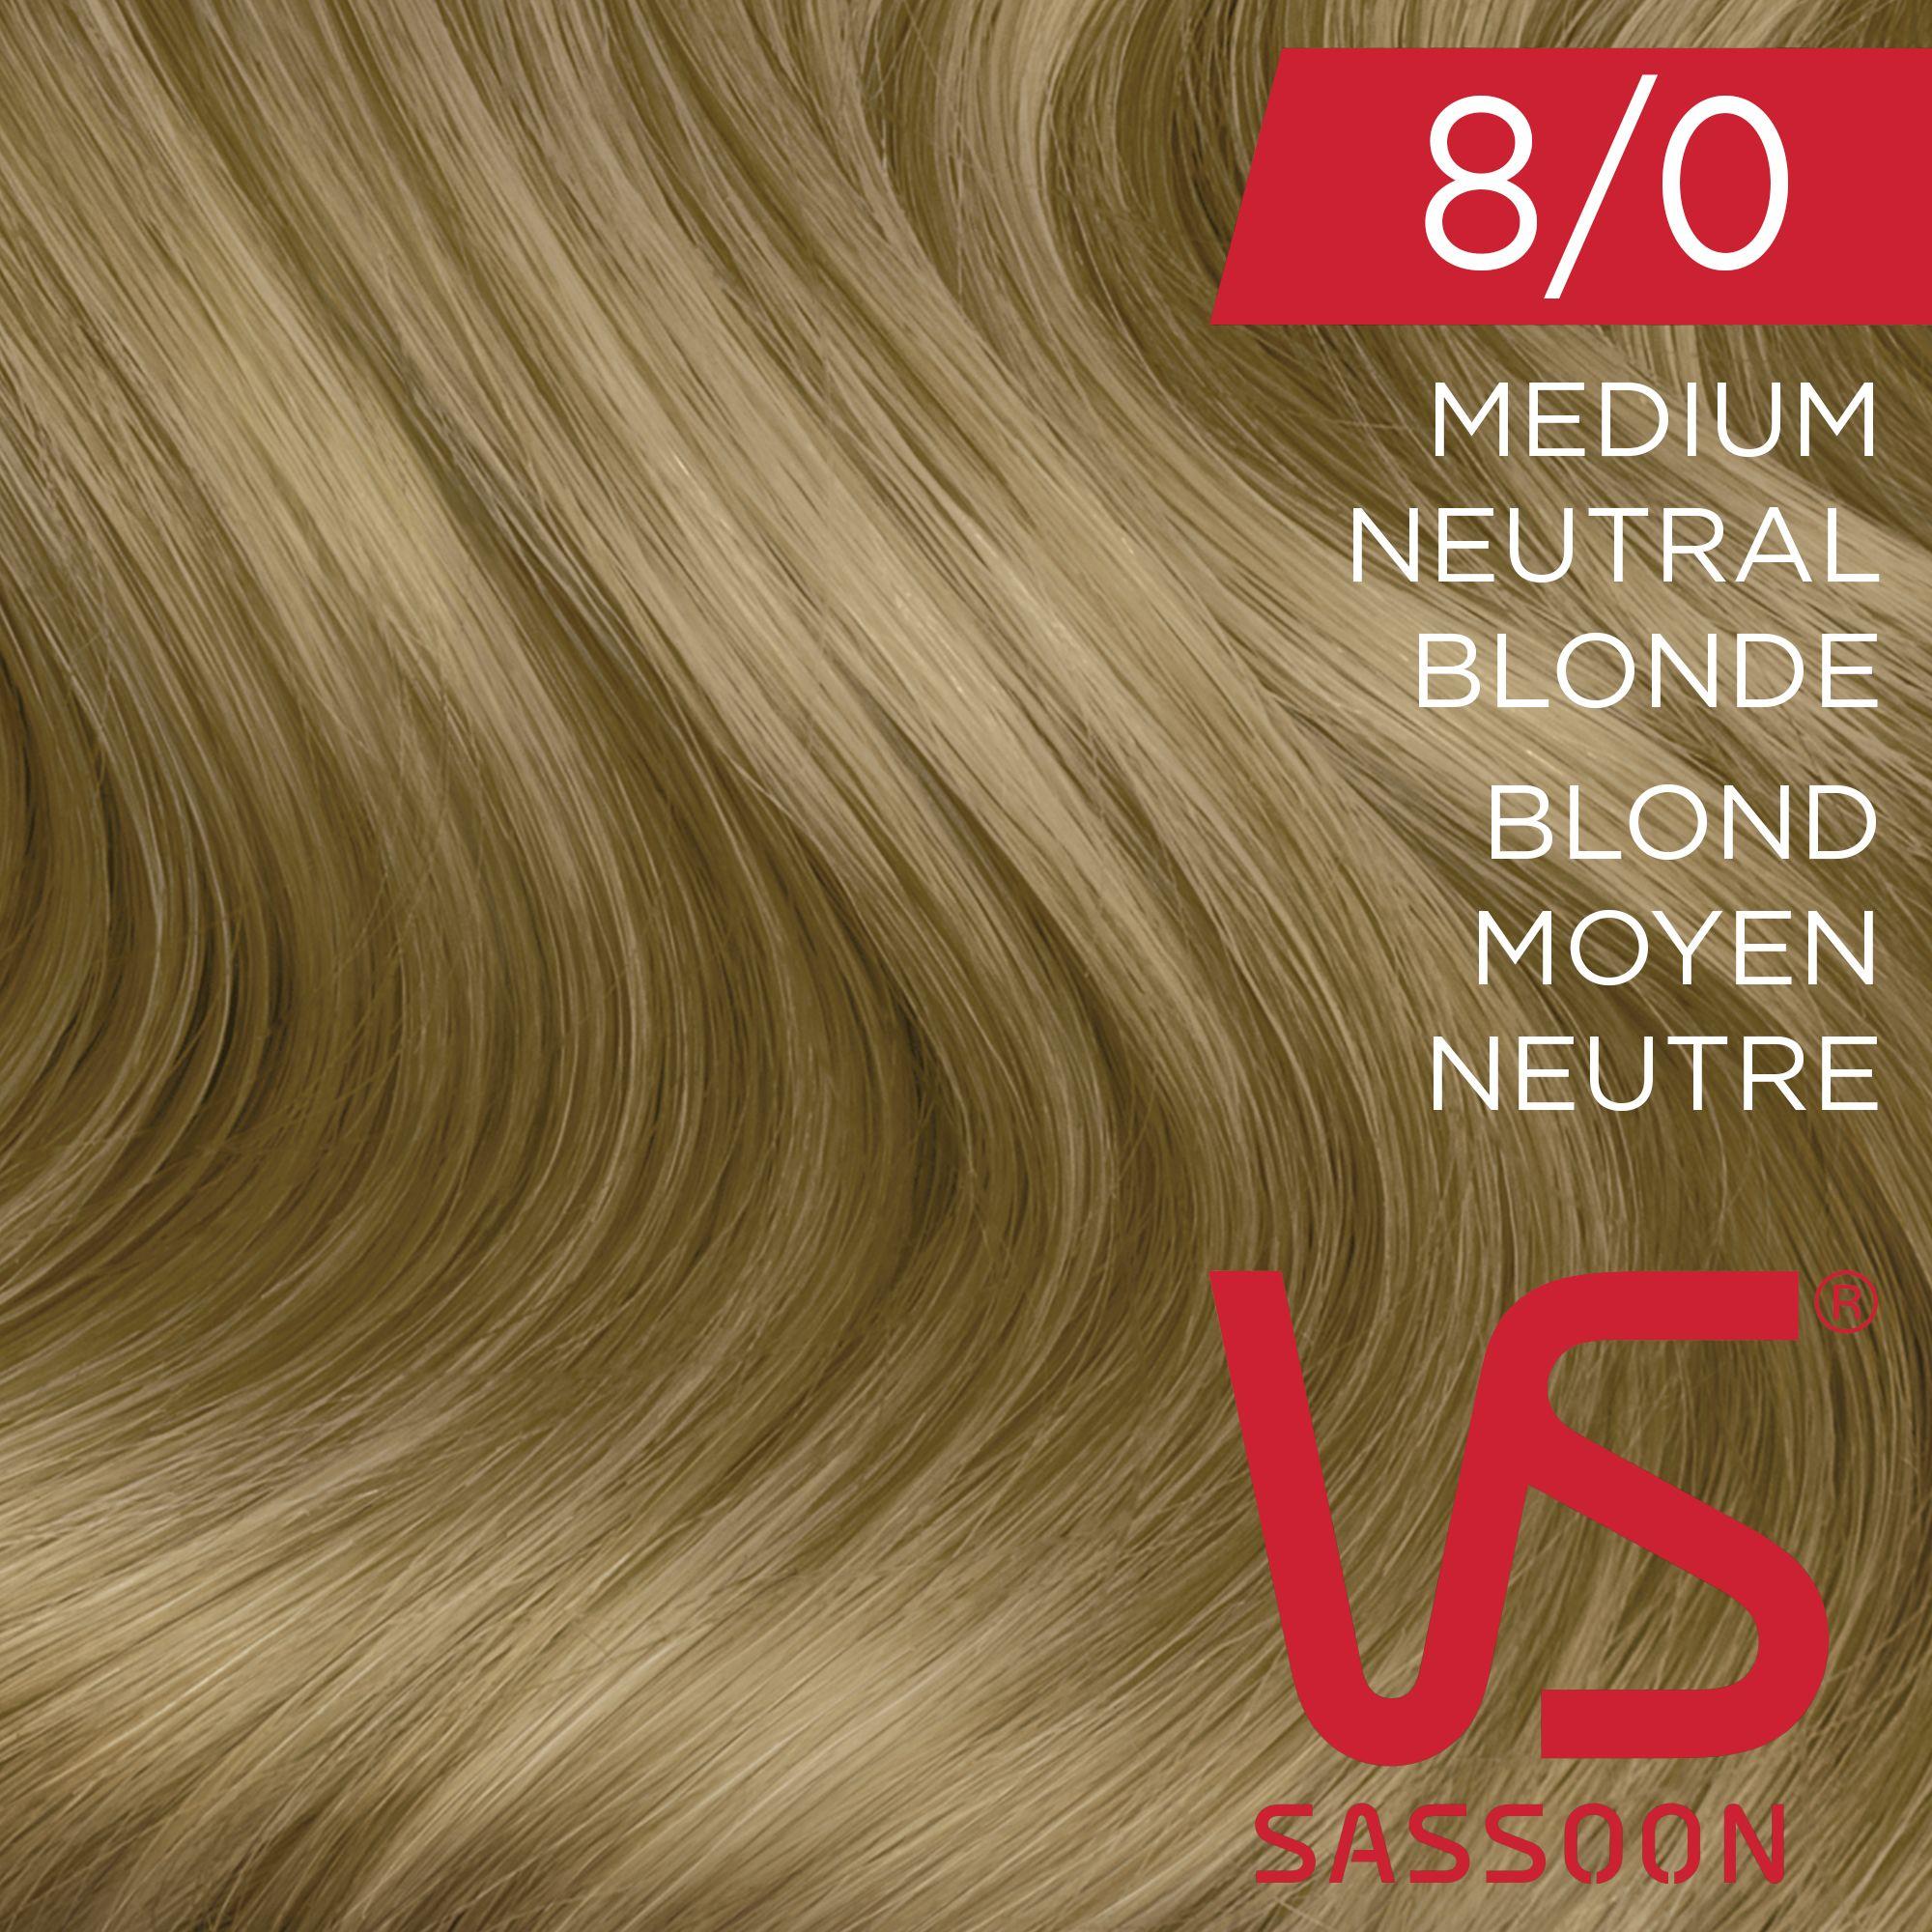 Vidal sassoon salonist diy hair color indulge in lavish medium natural blonde also best my chart gotitfree images on rh pinterest